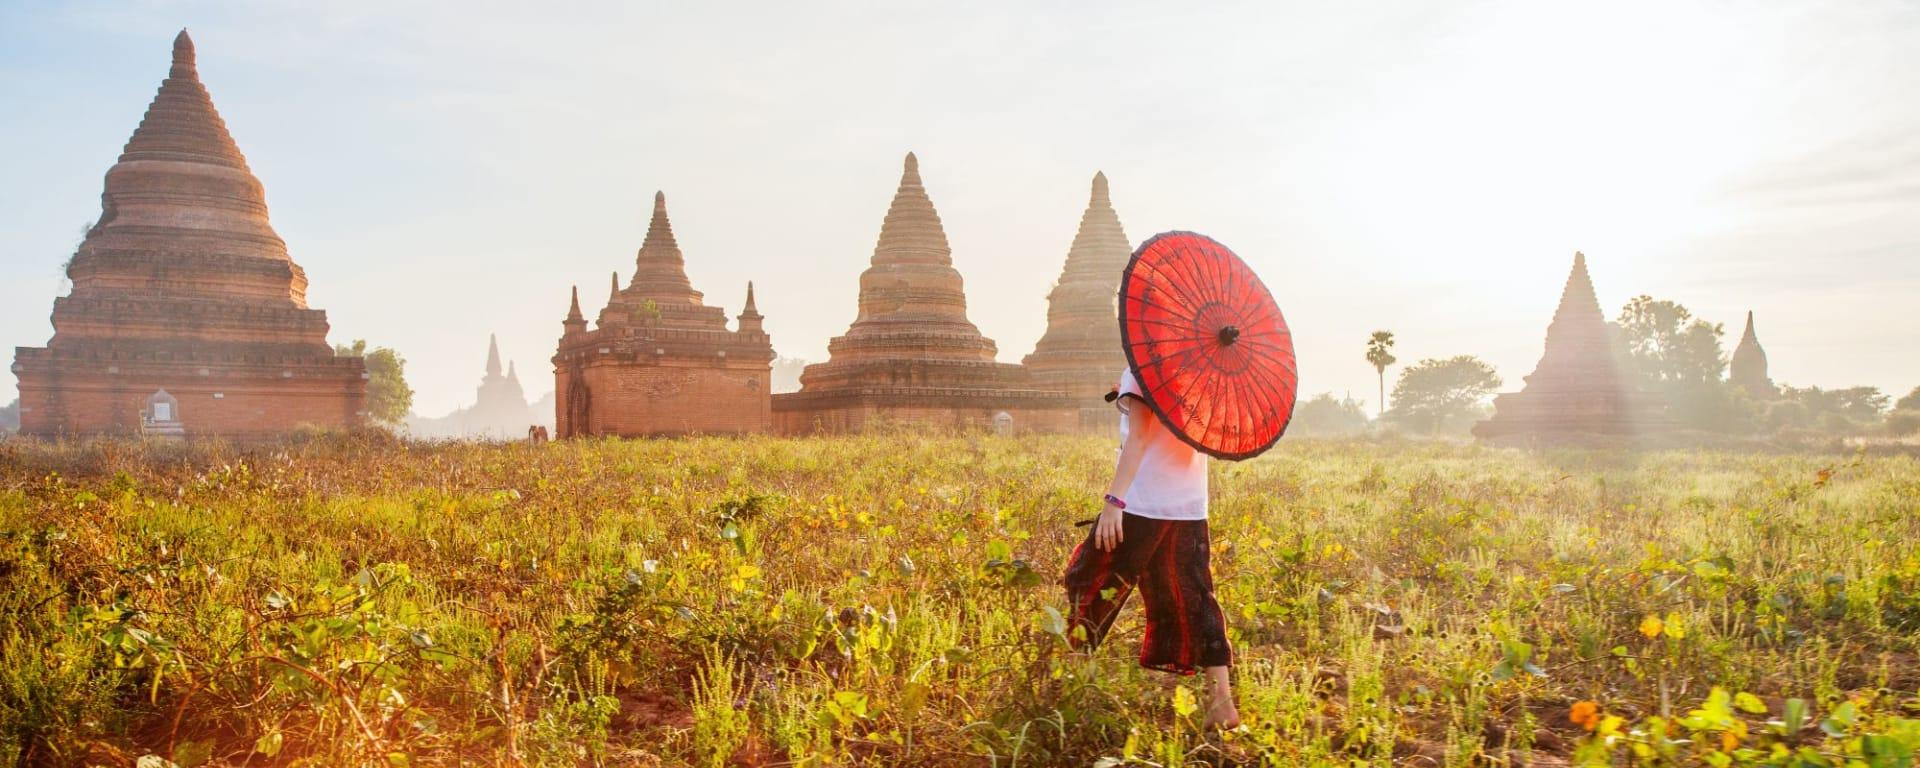 Faszination Myanmar - Ein Land im Wandel ab Naypyitaw: Bagan Young girl with traditional burmese parasol